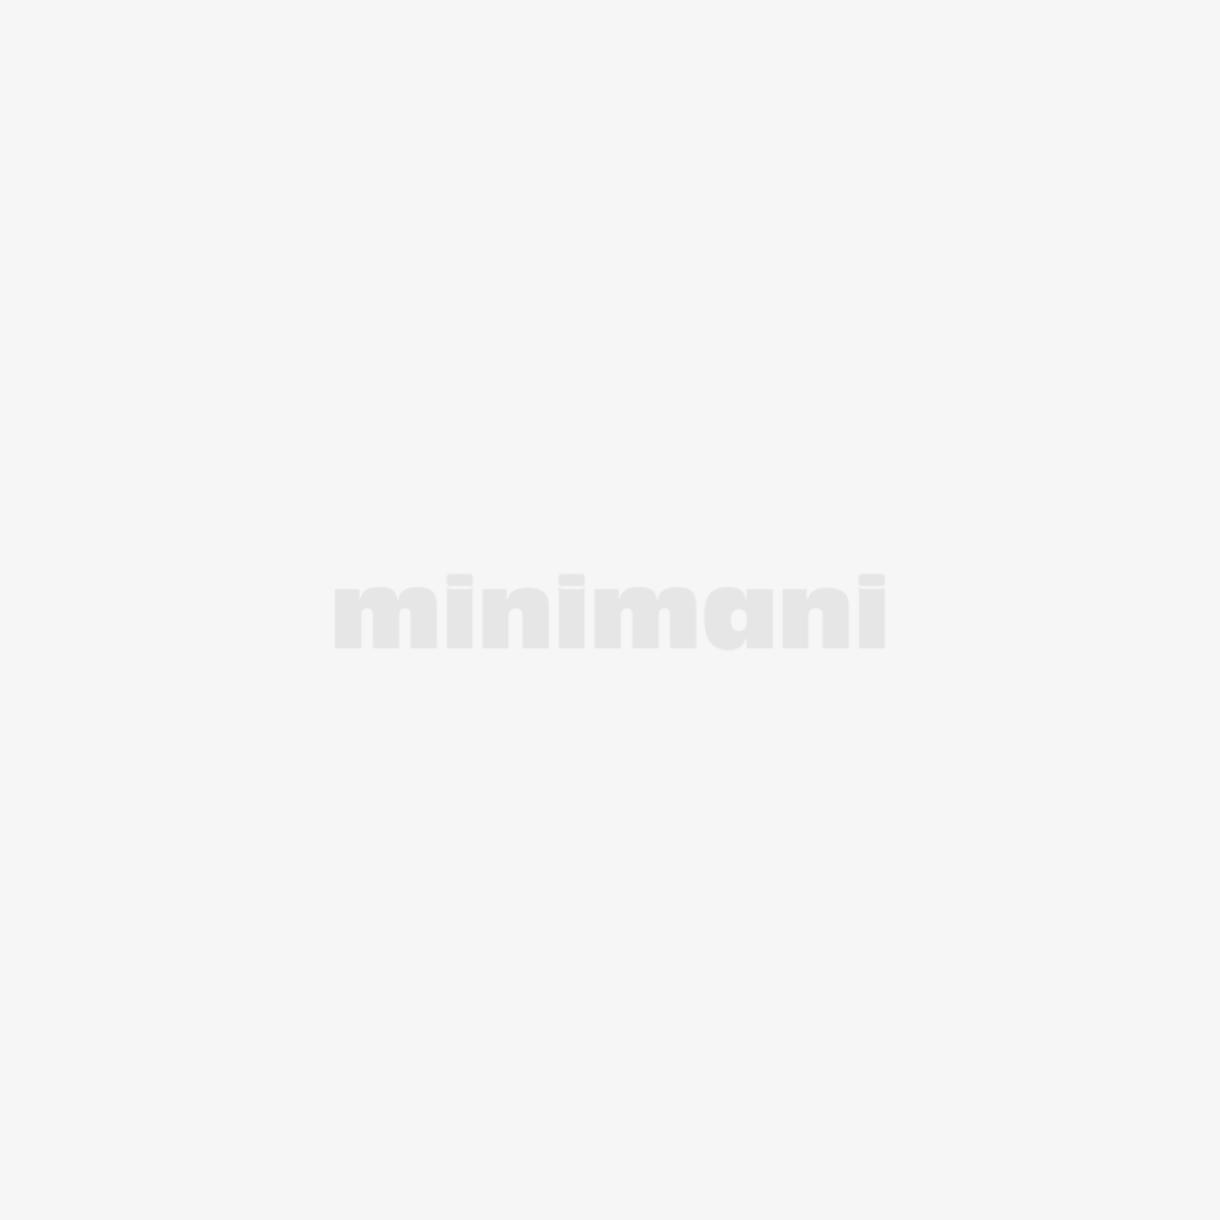 TOREUTICS-ALBUMI 300 KUVALLE,